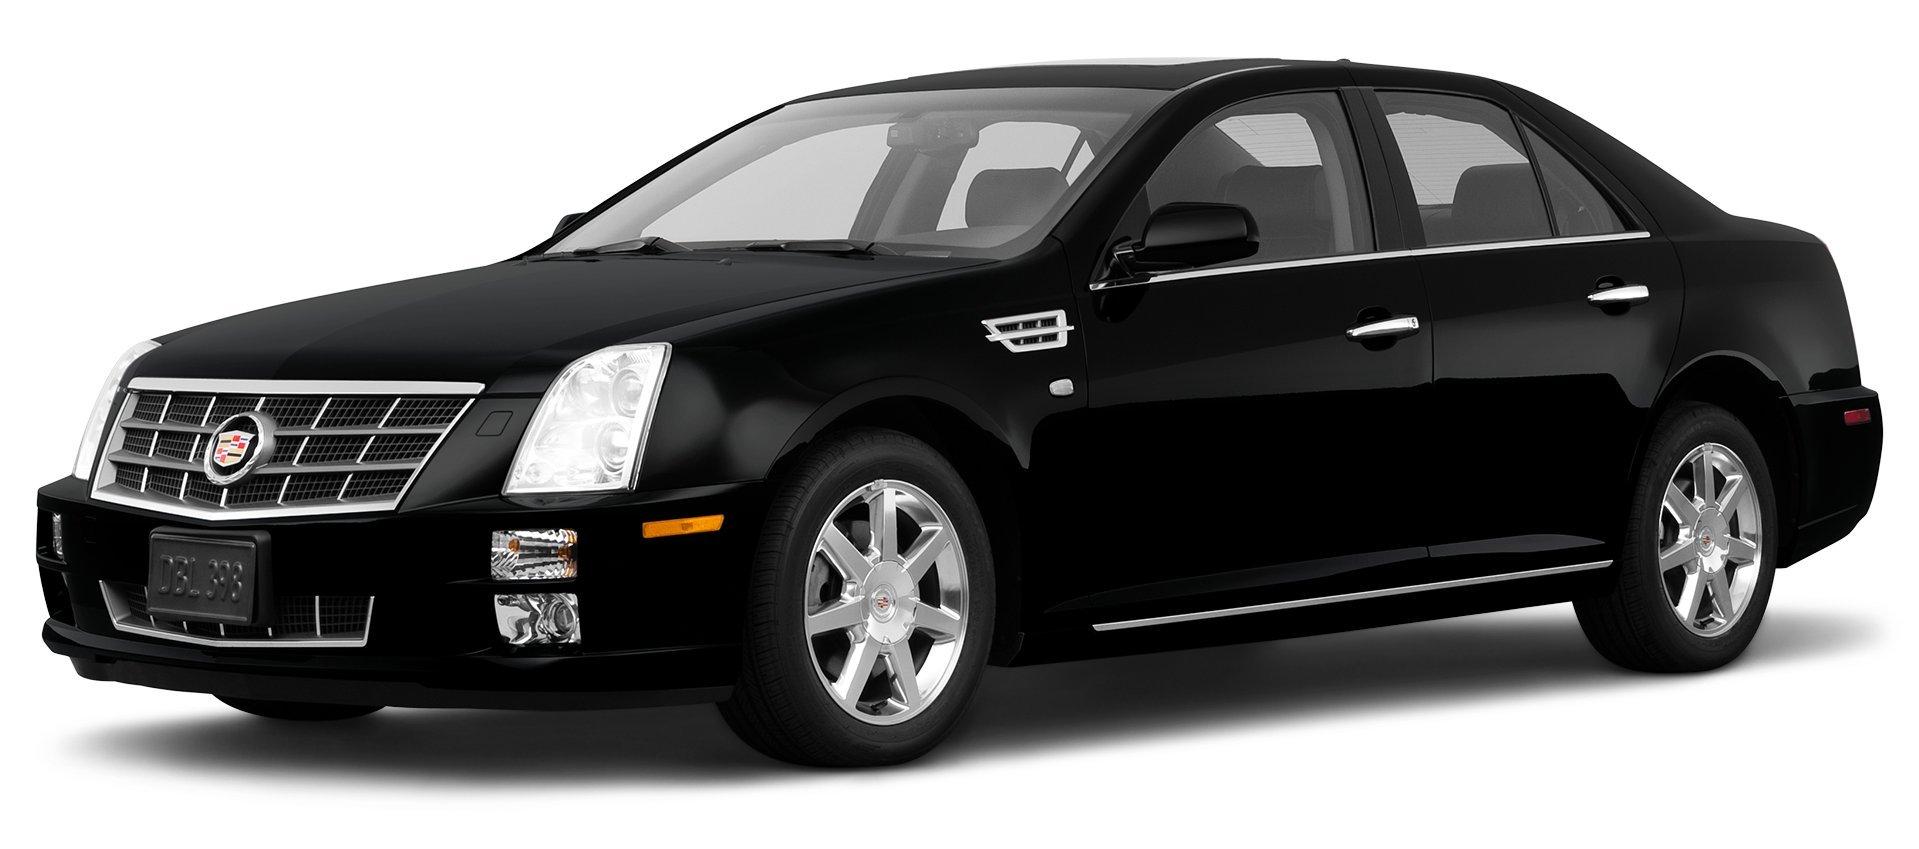 2011 Mercedes Benz E350 Reviews Images And Specs Vehicles Ml320 Fuel Filter Location Cadillac Sts All Wheel Drive W 1sb 4 Door Sedan V6